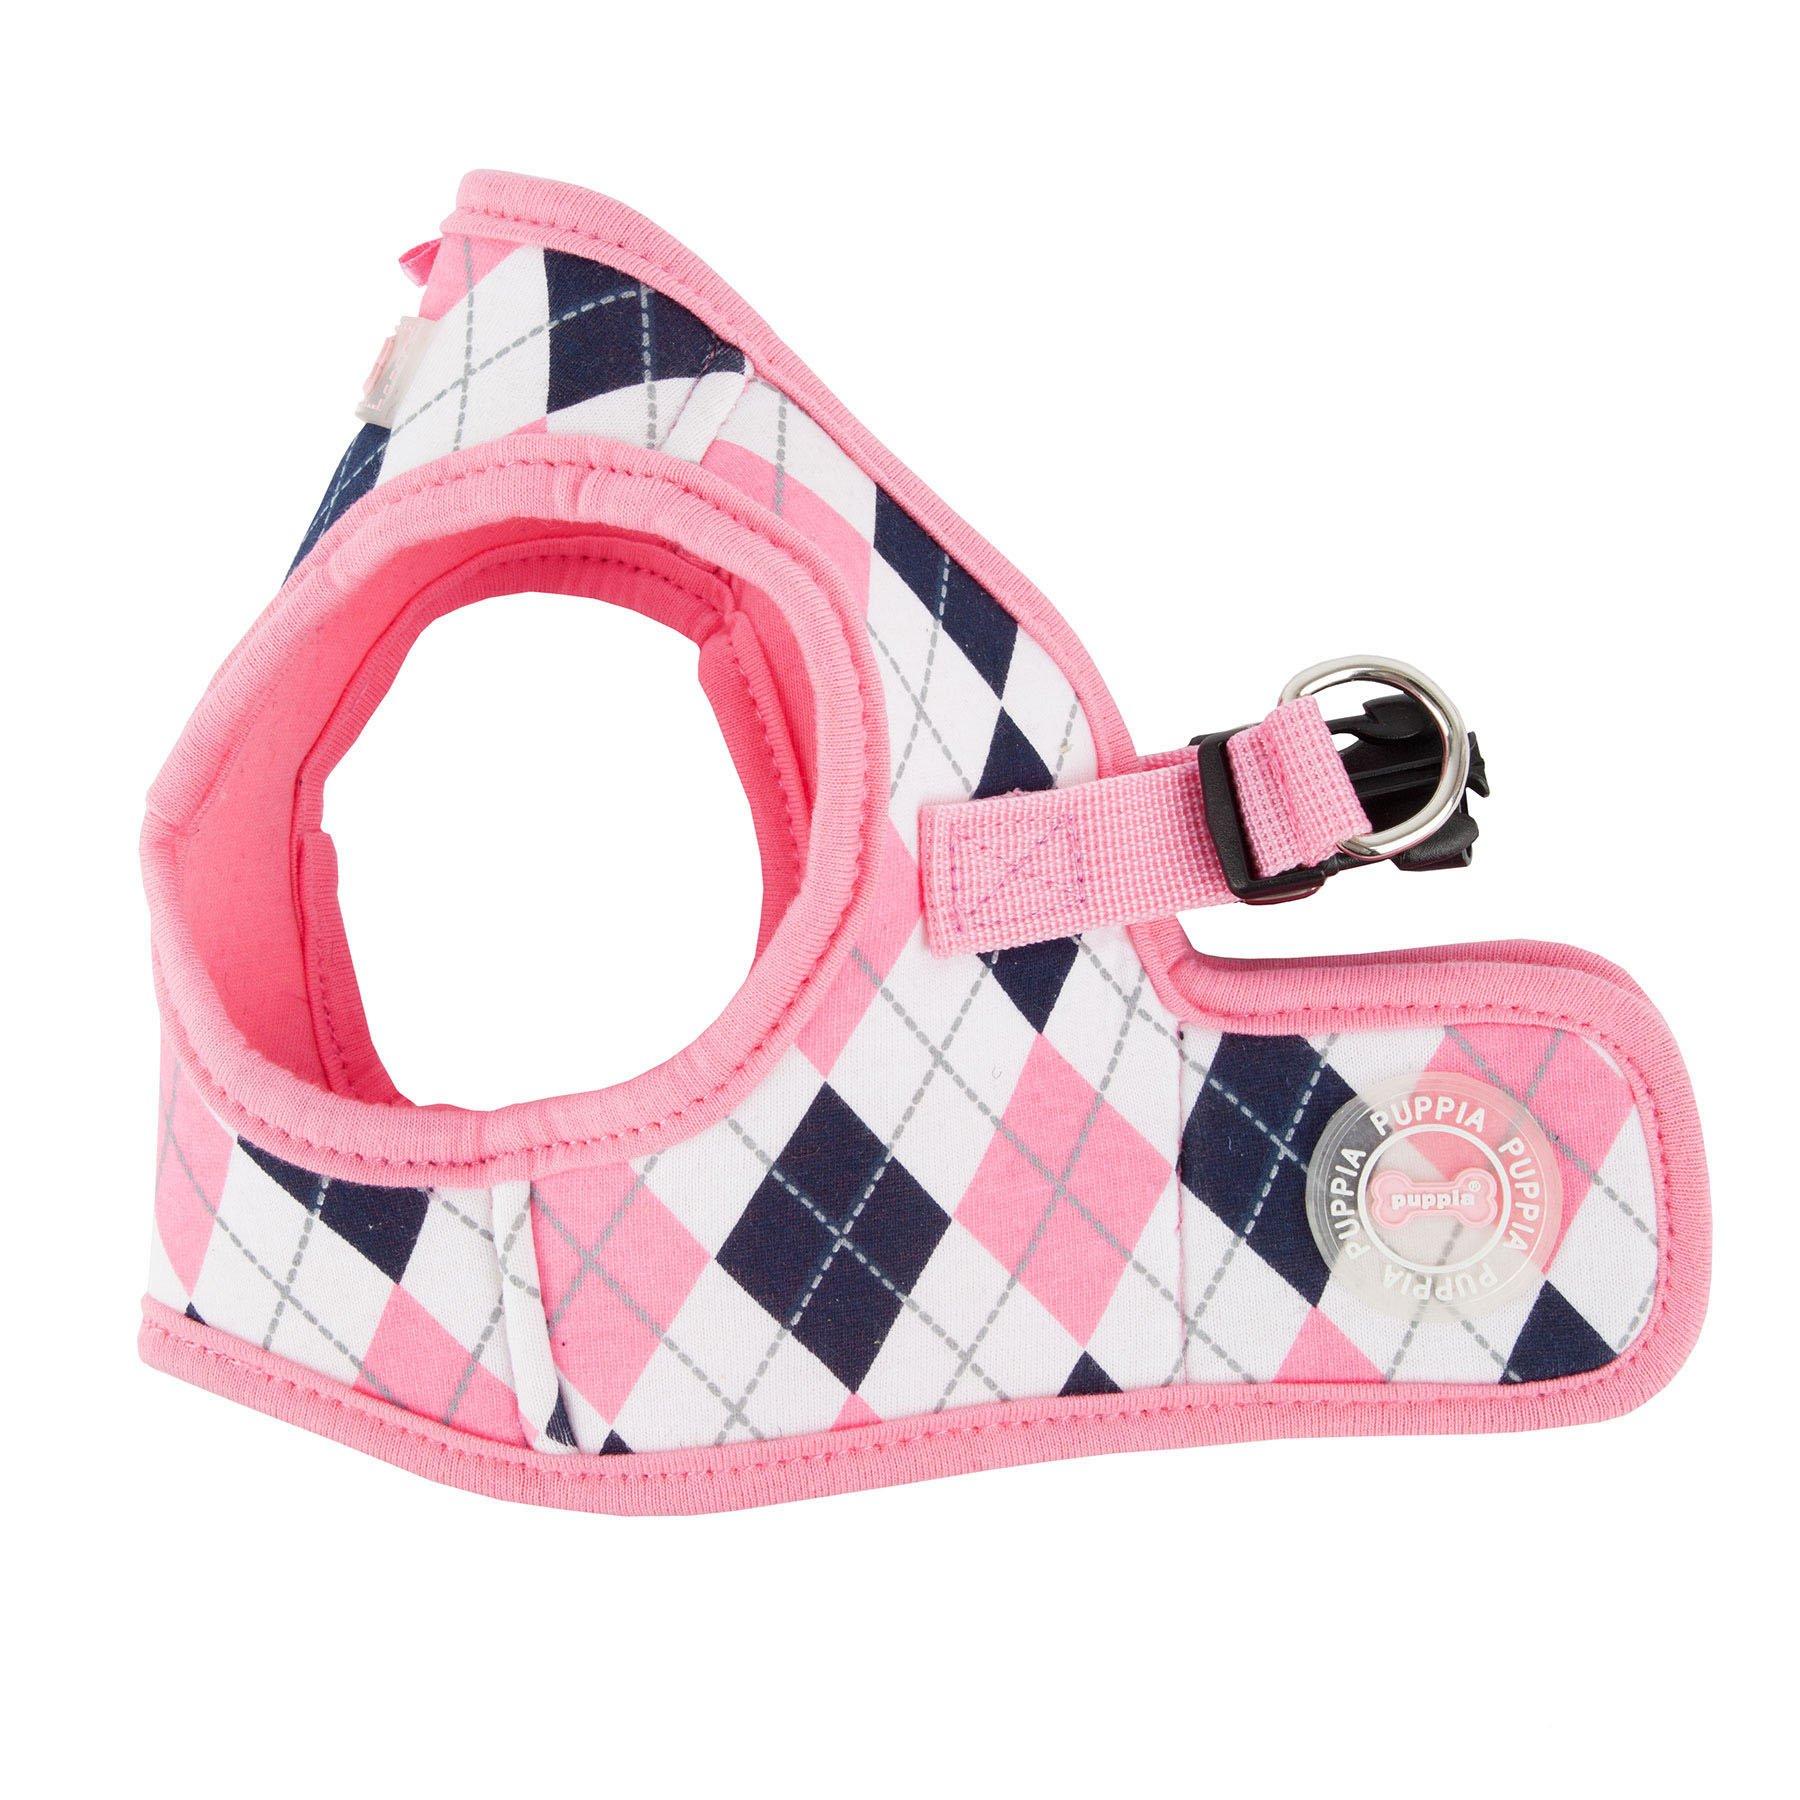 Puppia Authentic Argyle Harness B, X-Large, Pink